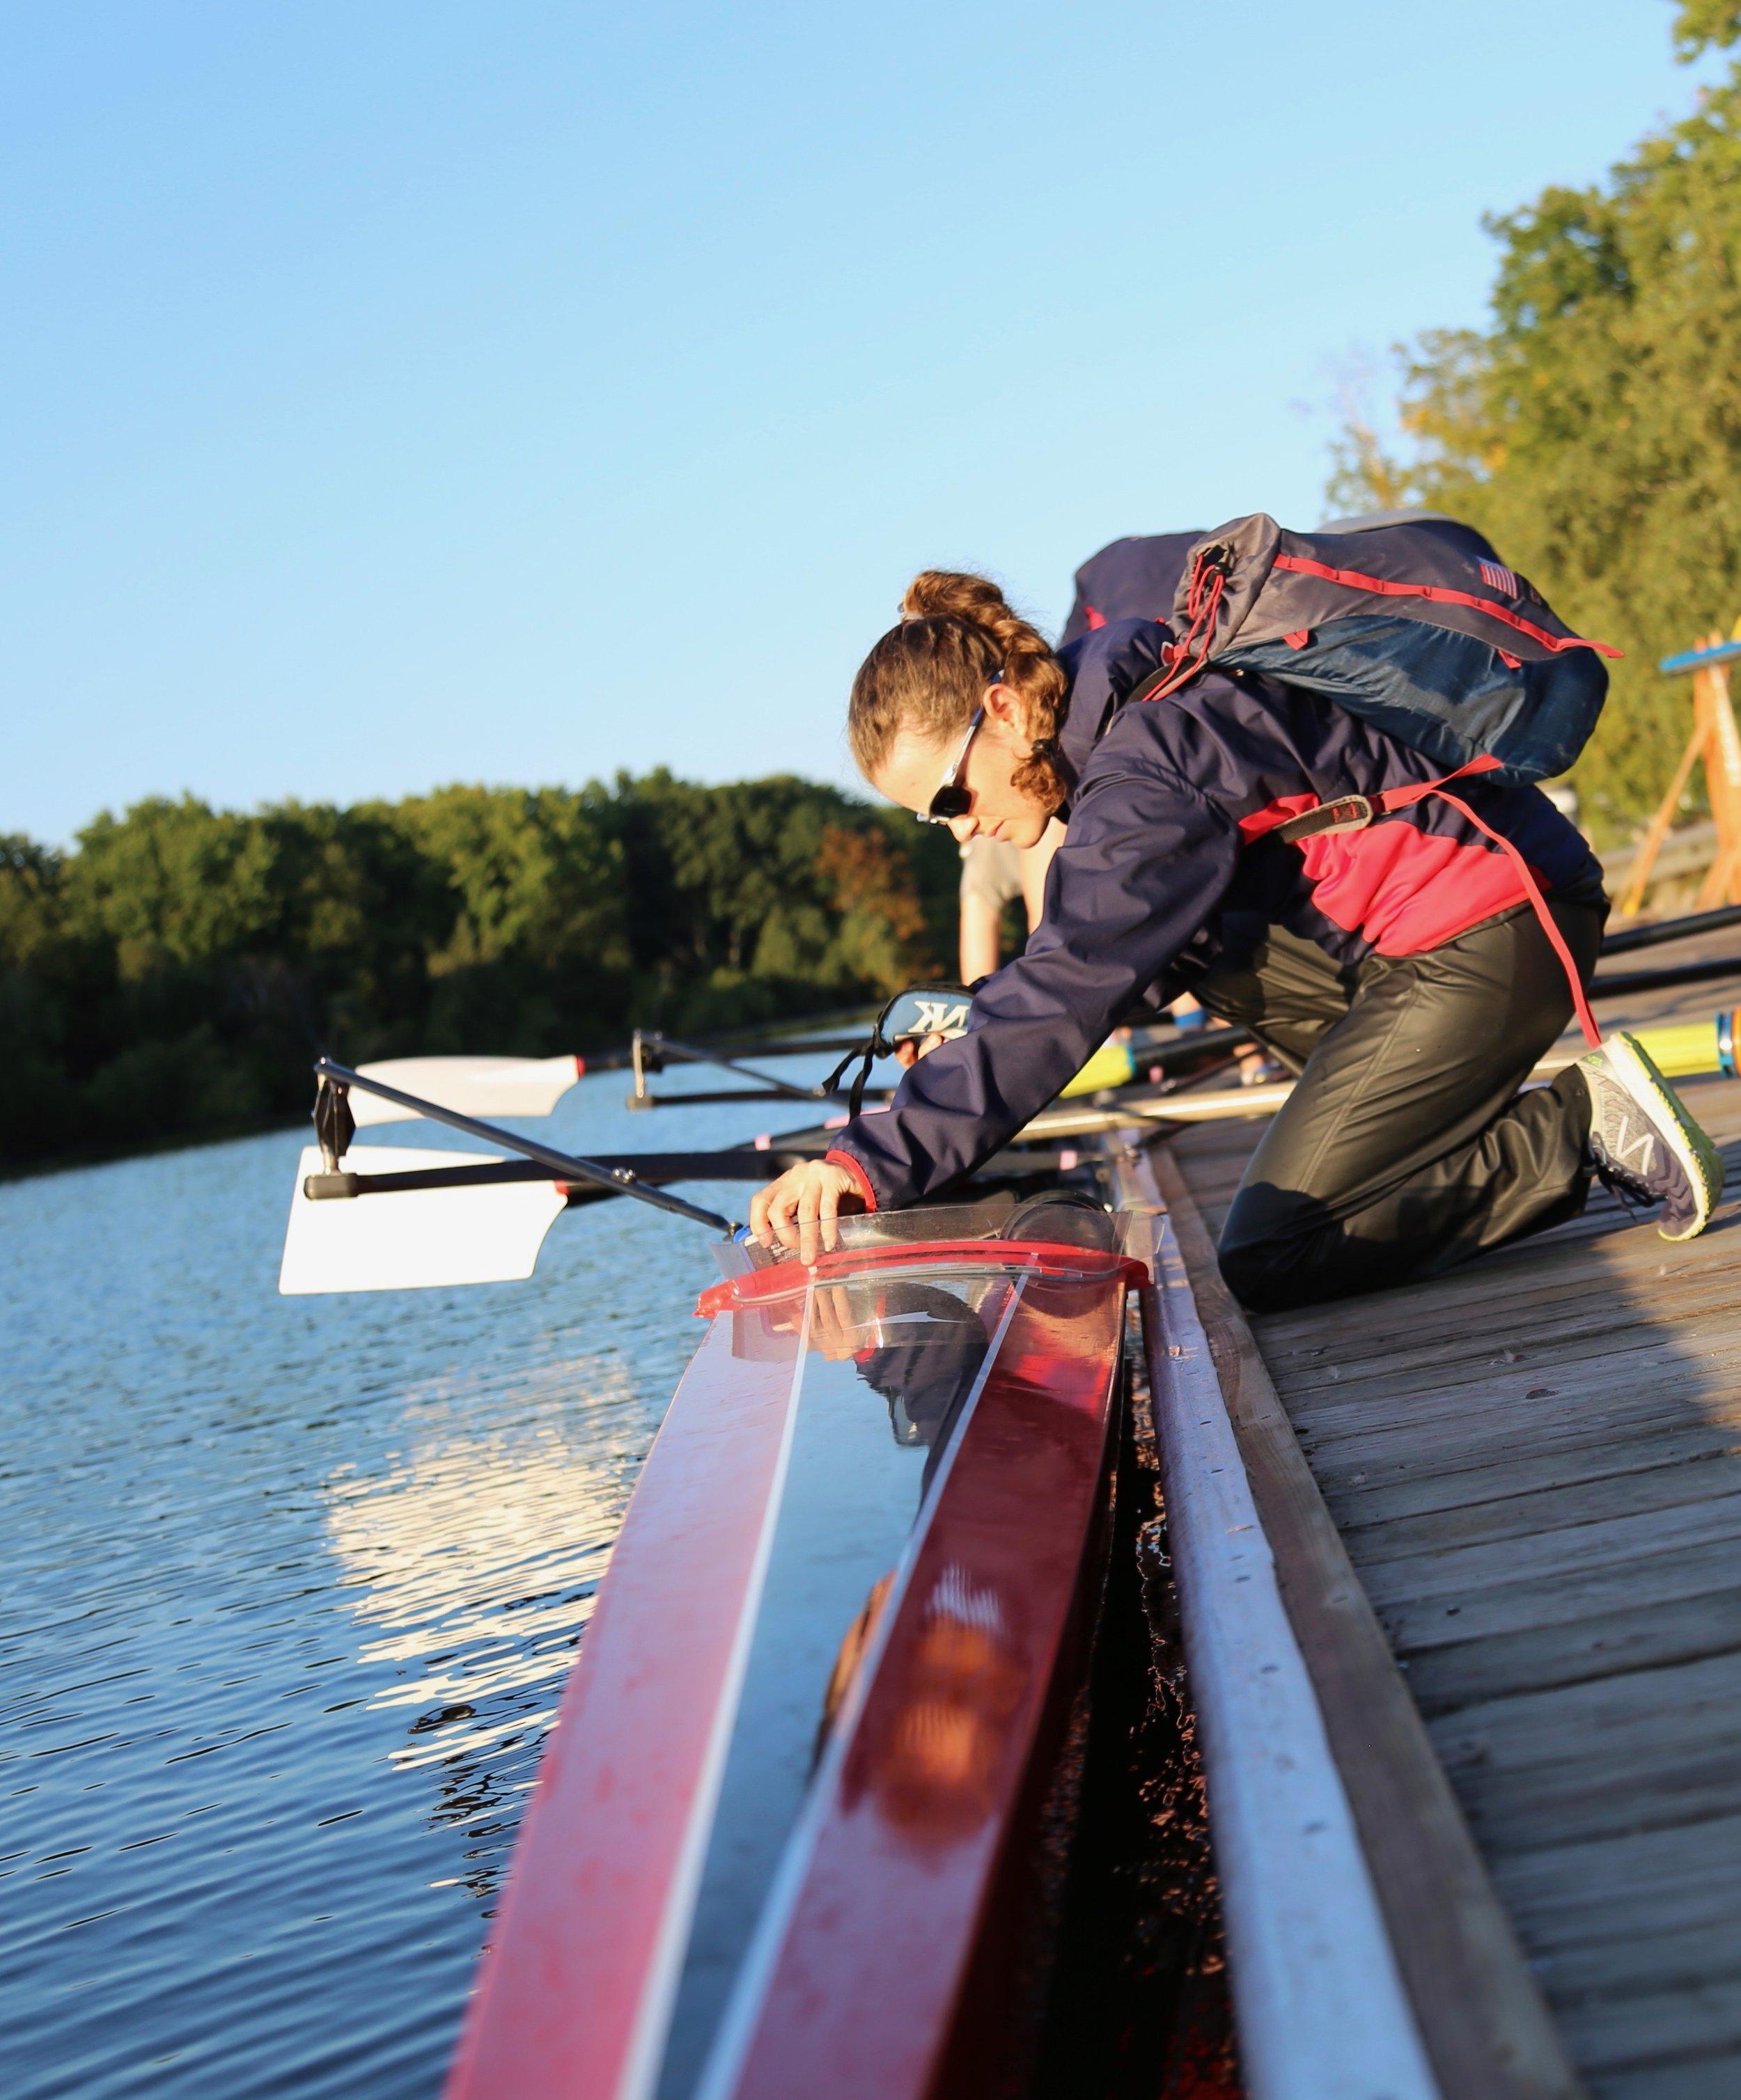 Jenny Sichel on the CRI dock